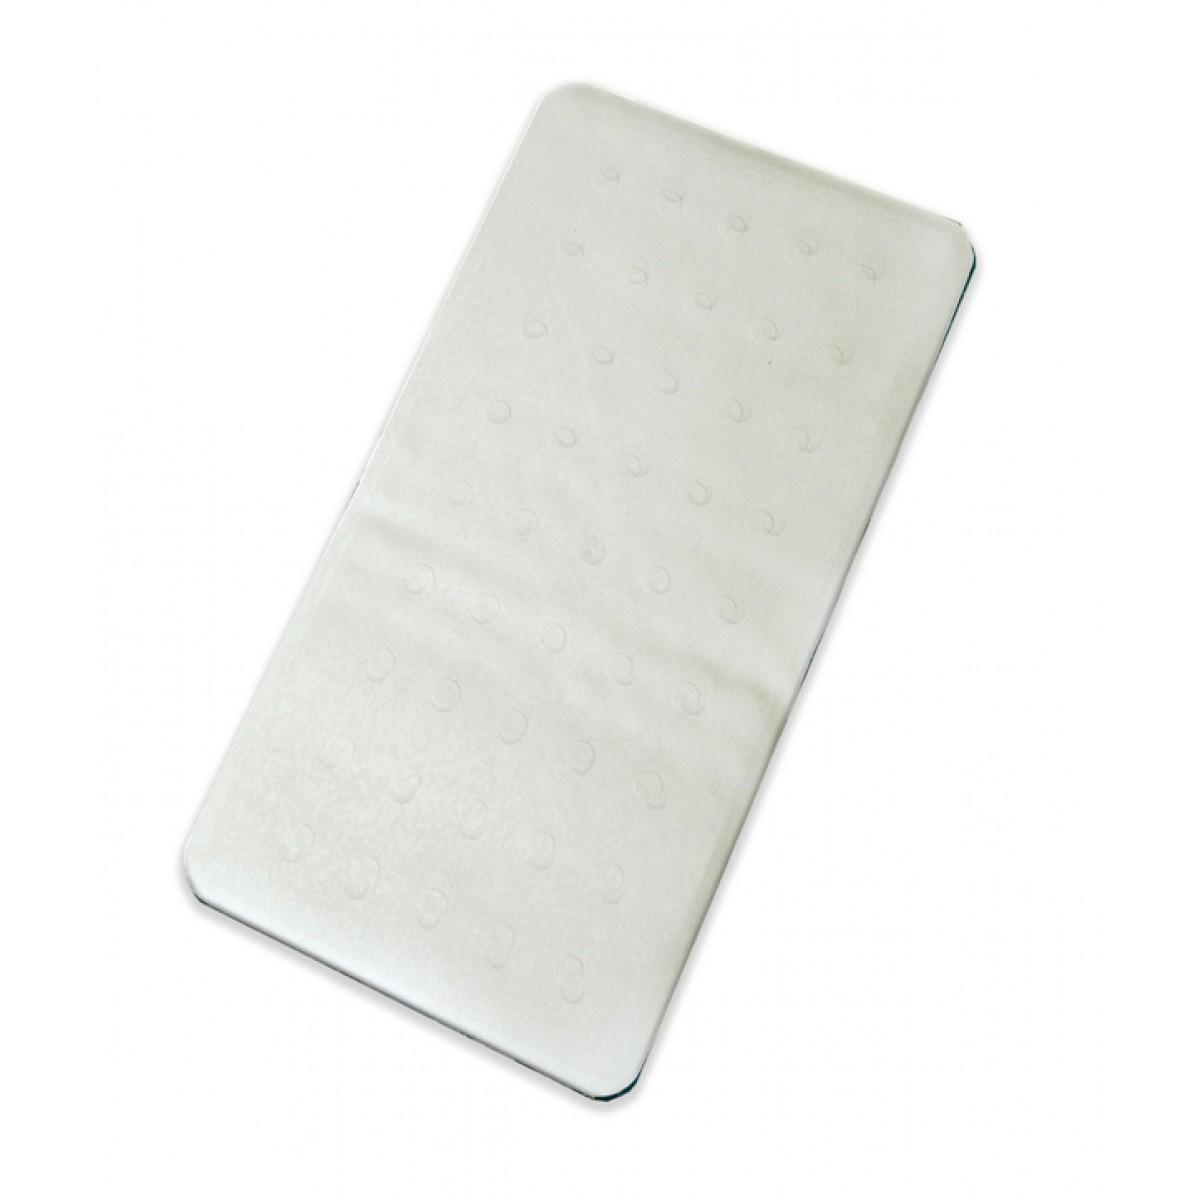 Skridsikkermåtte t/ badekar hvid